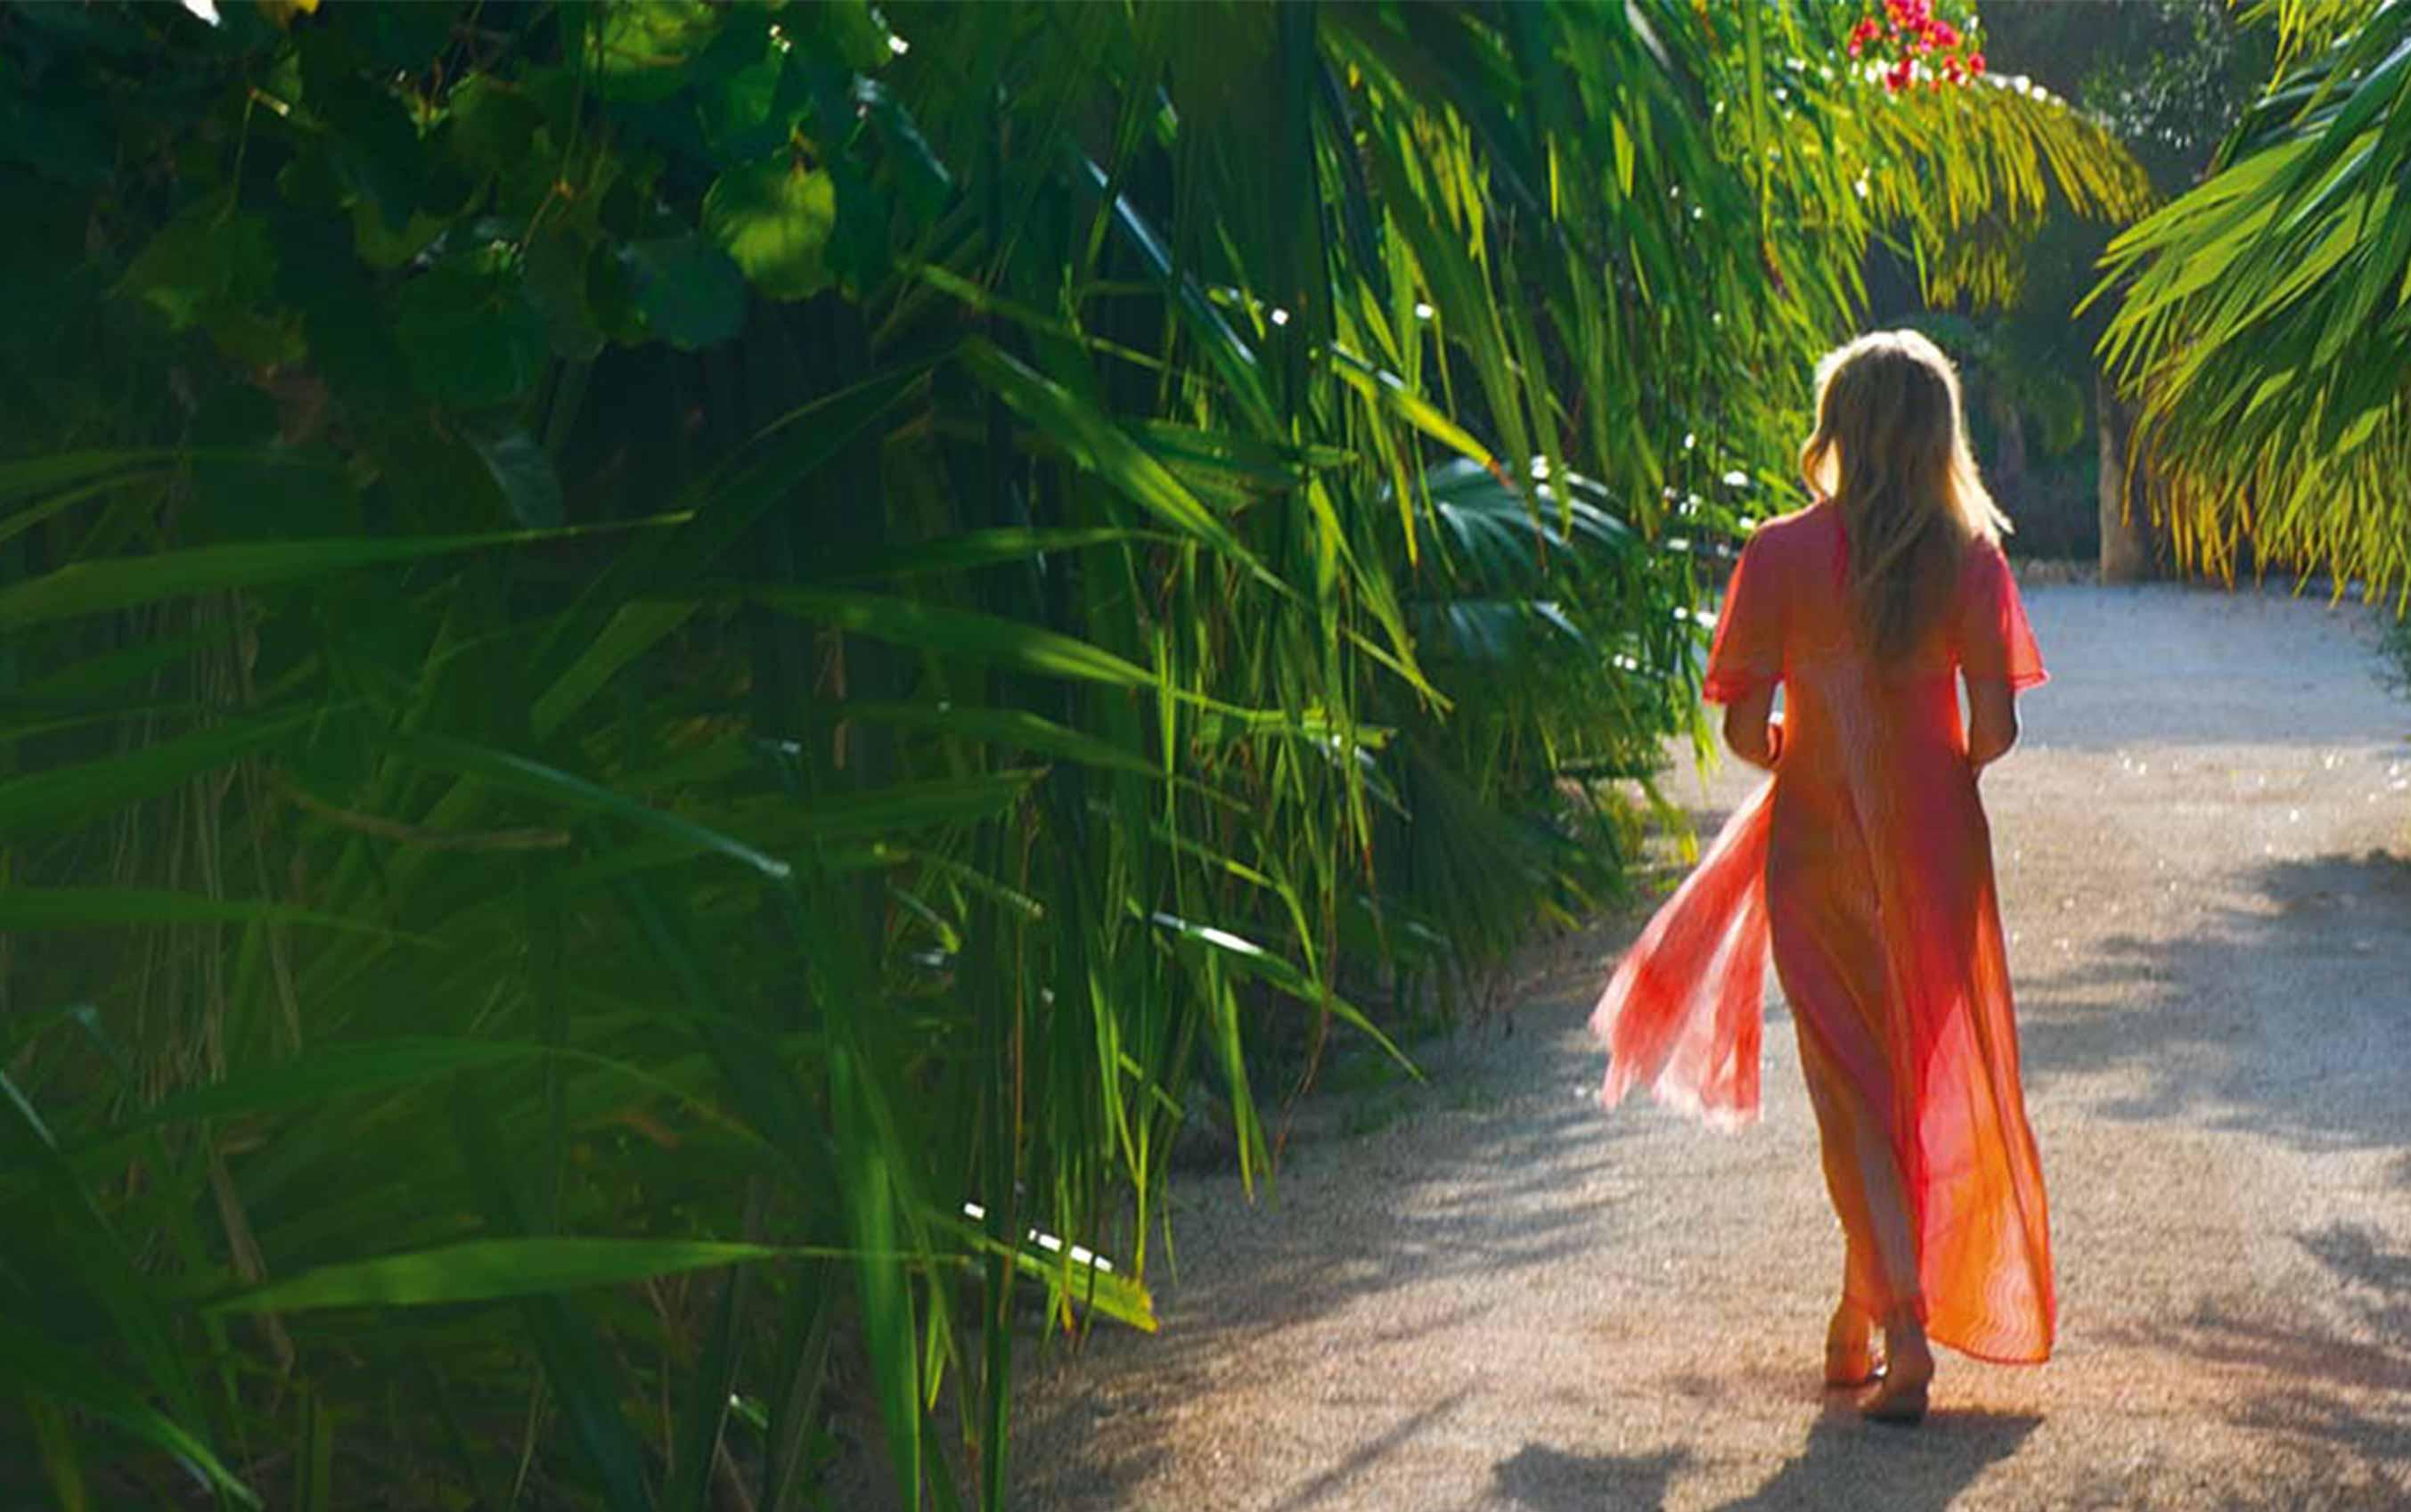 blonde woman walking on a path cutting through tropical foliage